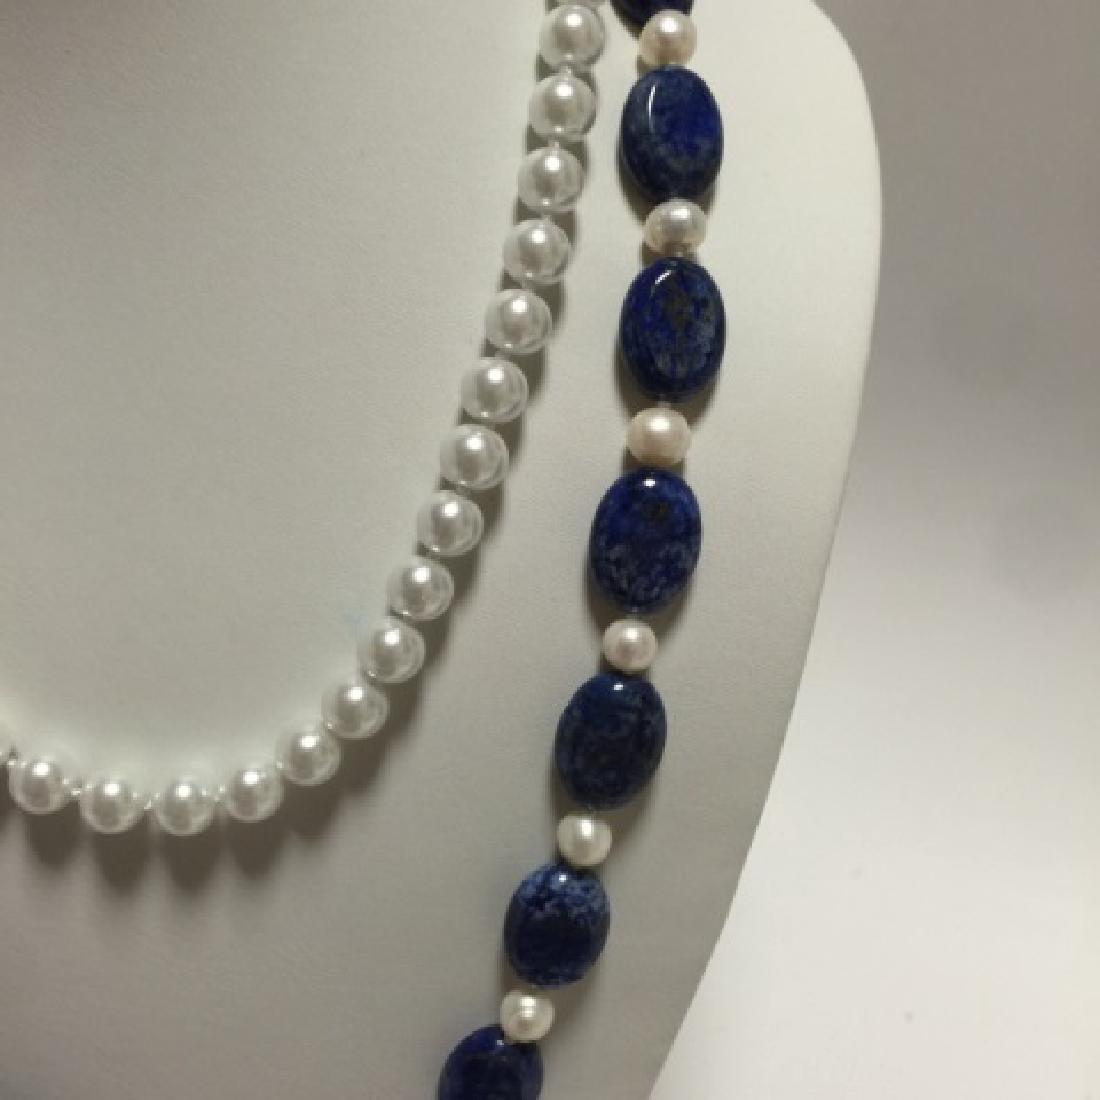 Lapis Lazuli Bead & Baroque Style Pearl Necklace - 2